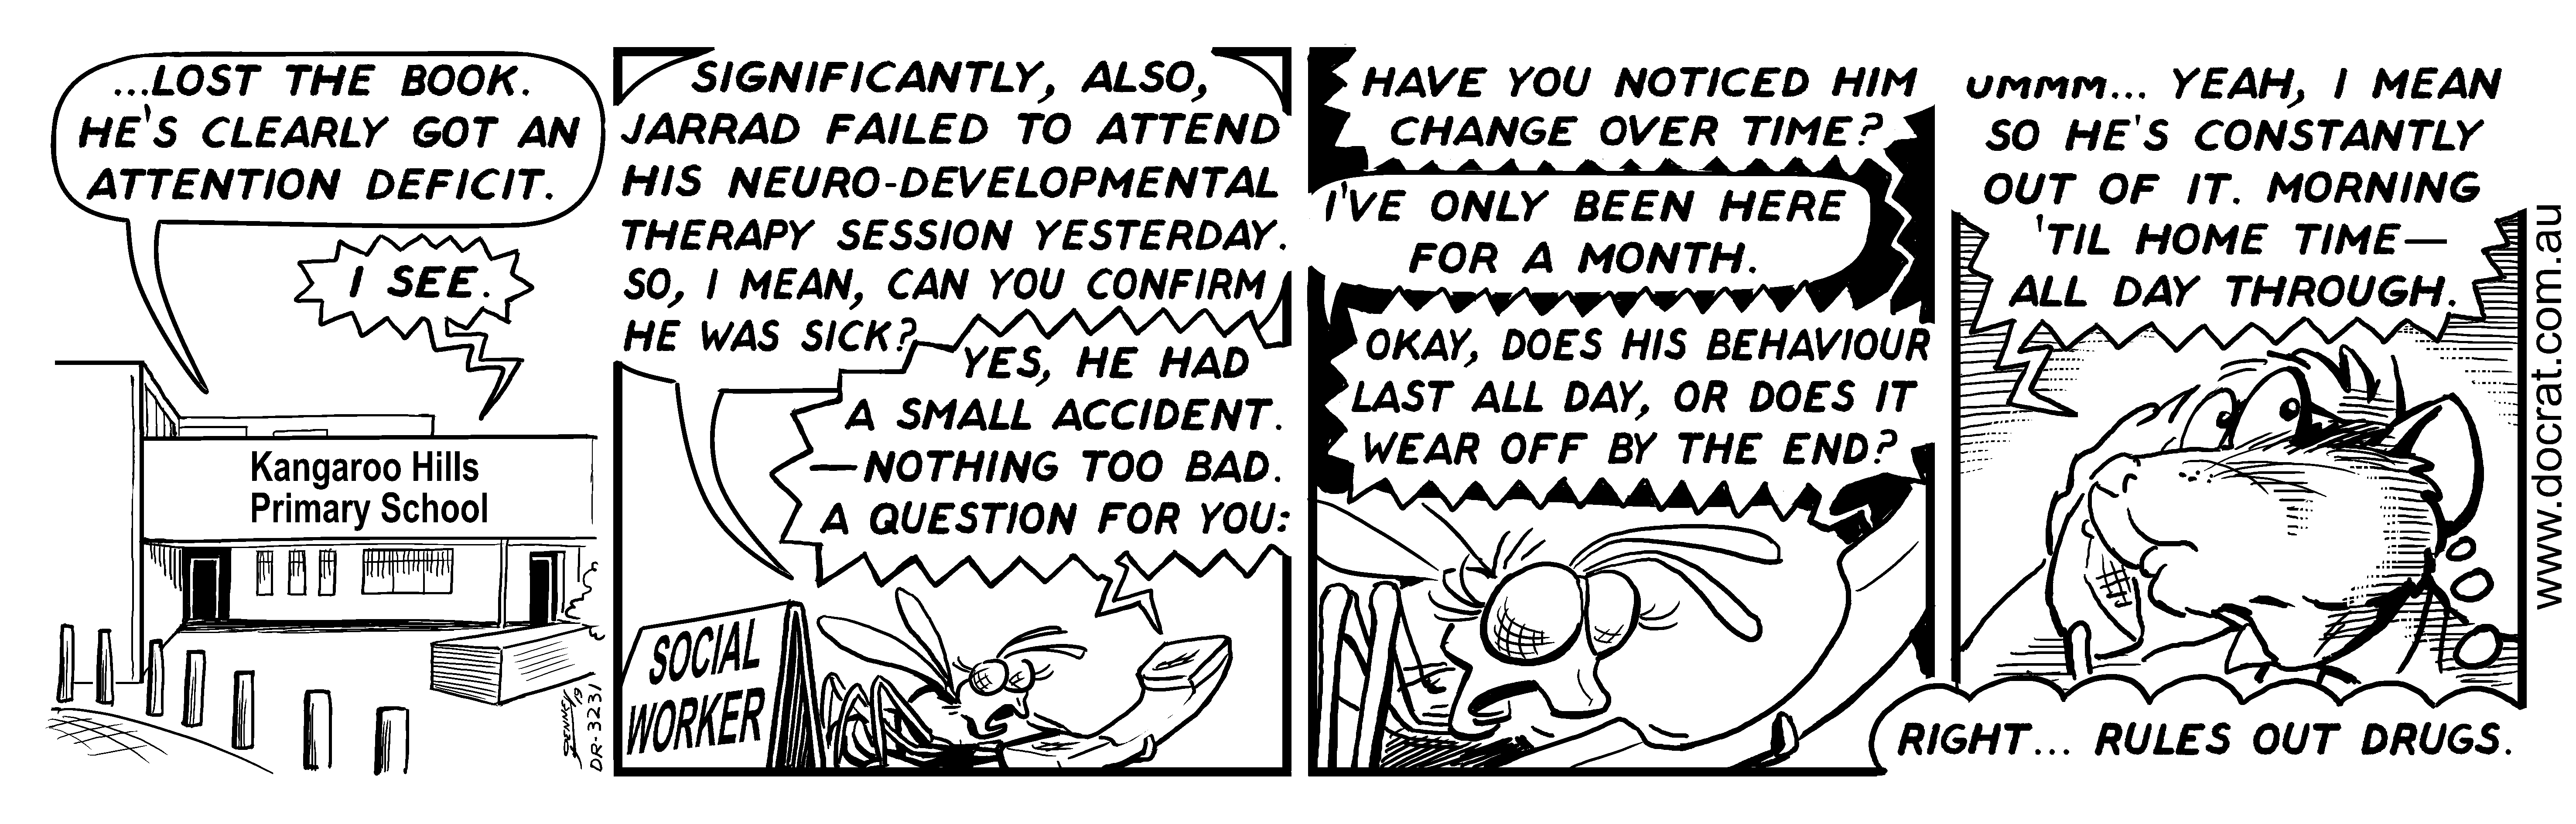 20190429